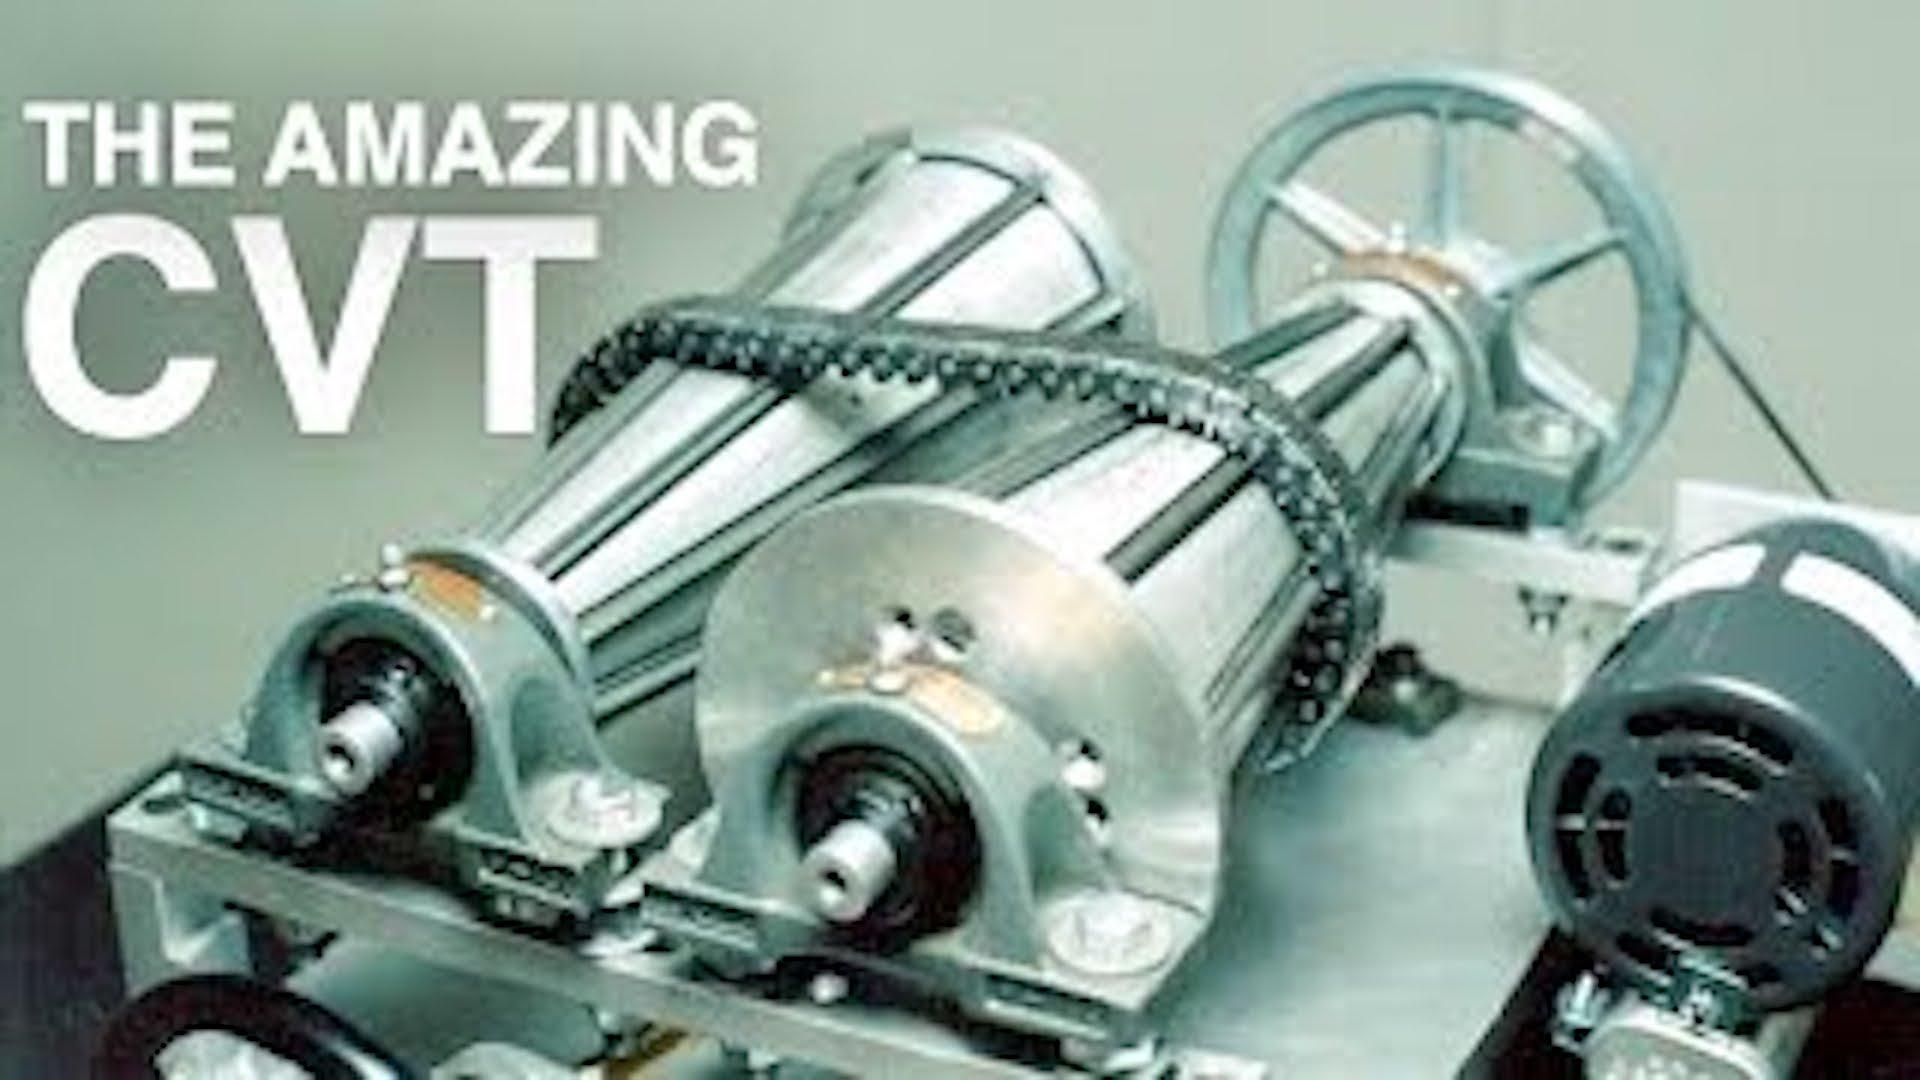 CVT transmission انواع گیربکس انواع گیربکس are cvts the fastest transmissions 100587530 h